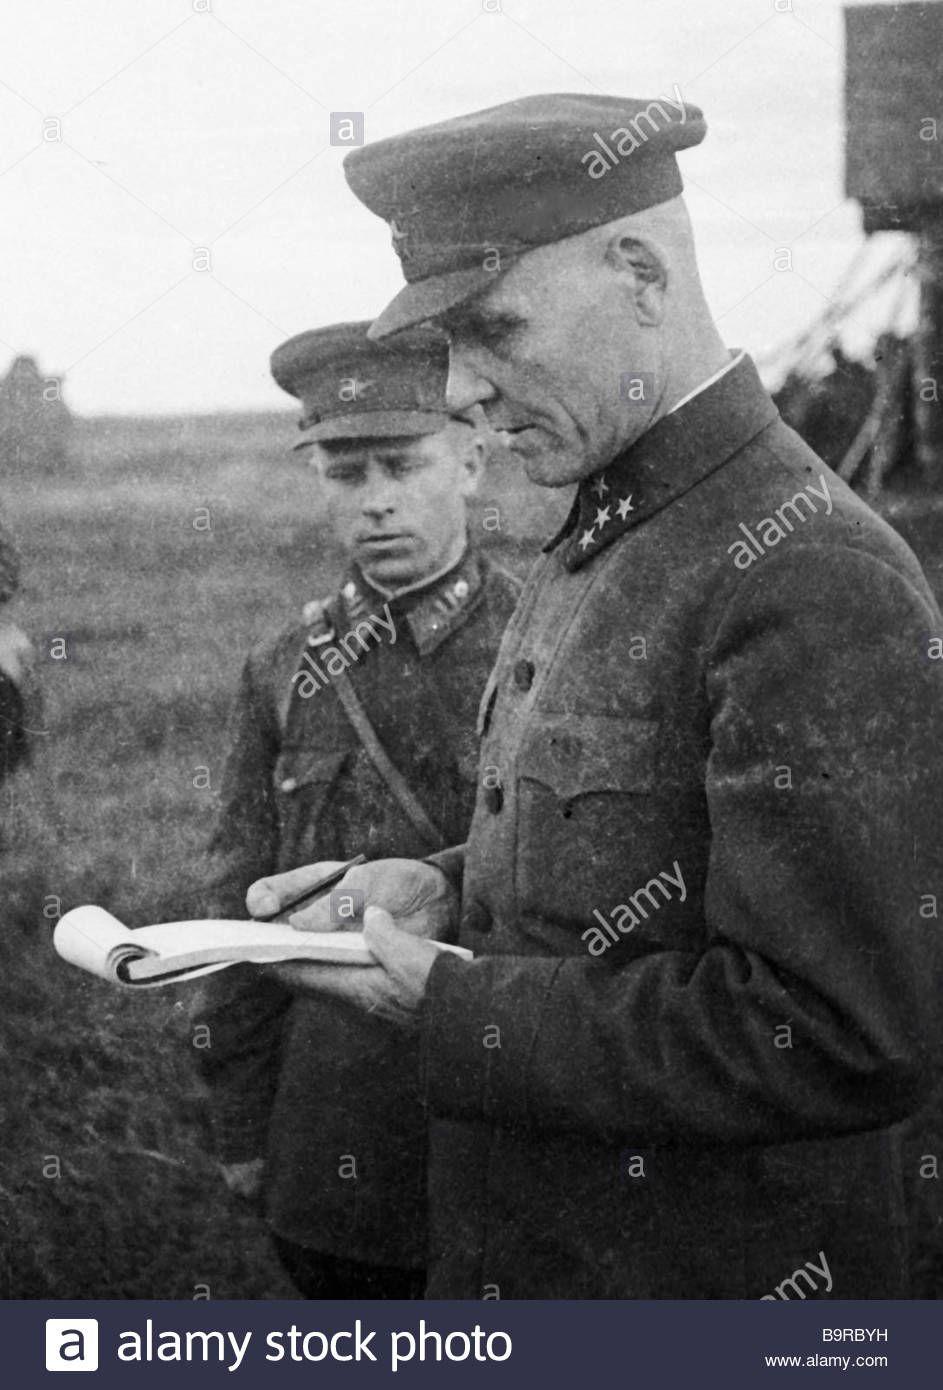 54b5cb1b7 Kalinin Front Commander Colonel General Ivan Konev | Marshal of the ...